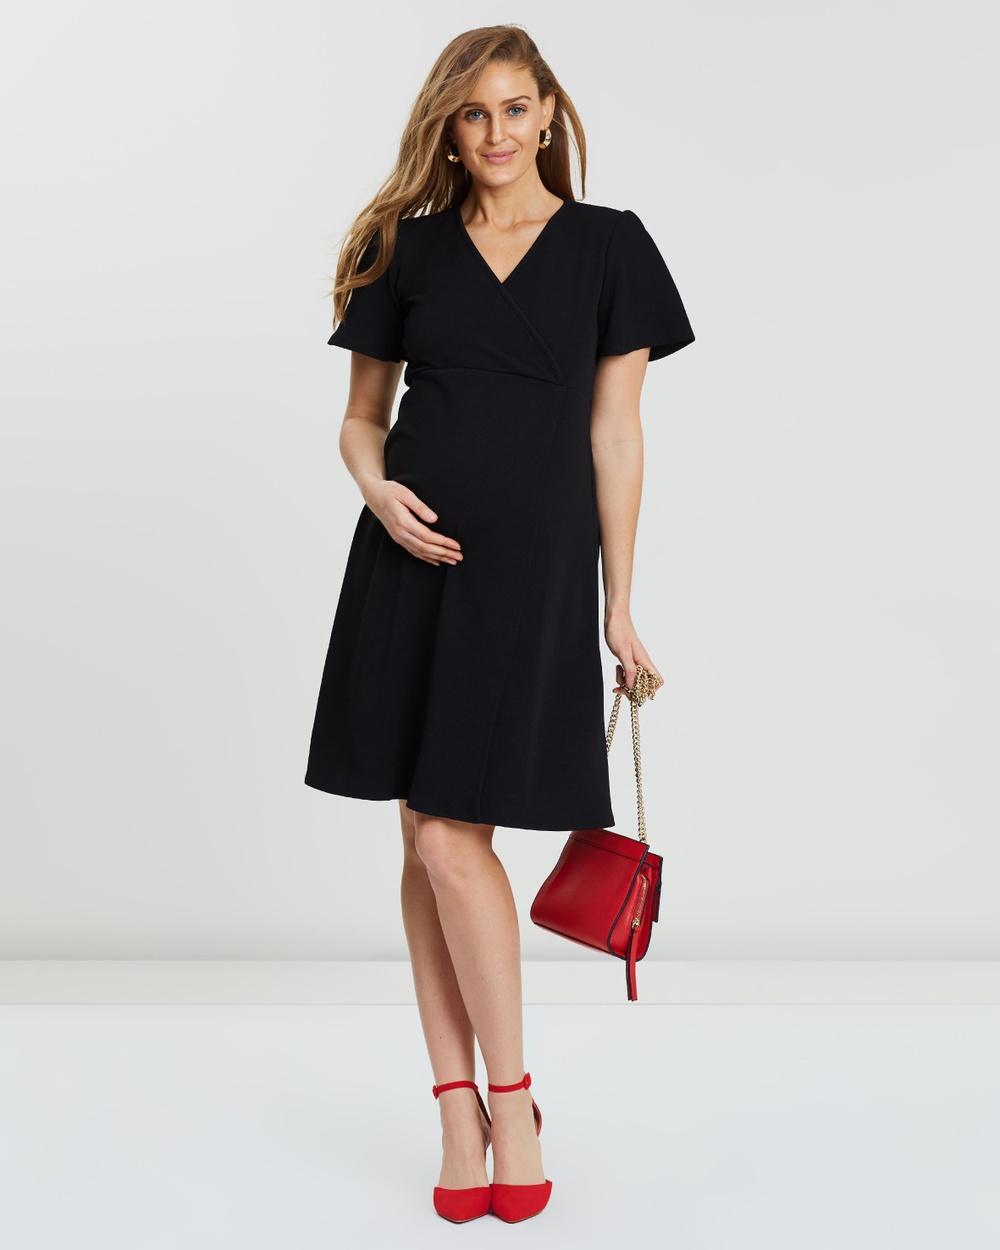 DP Maternity Black Crepe Wrap Dress